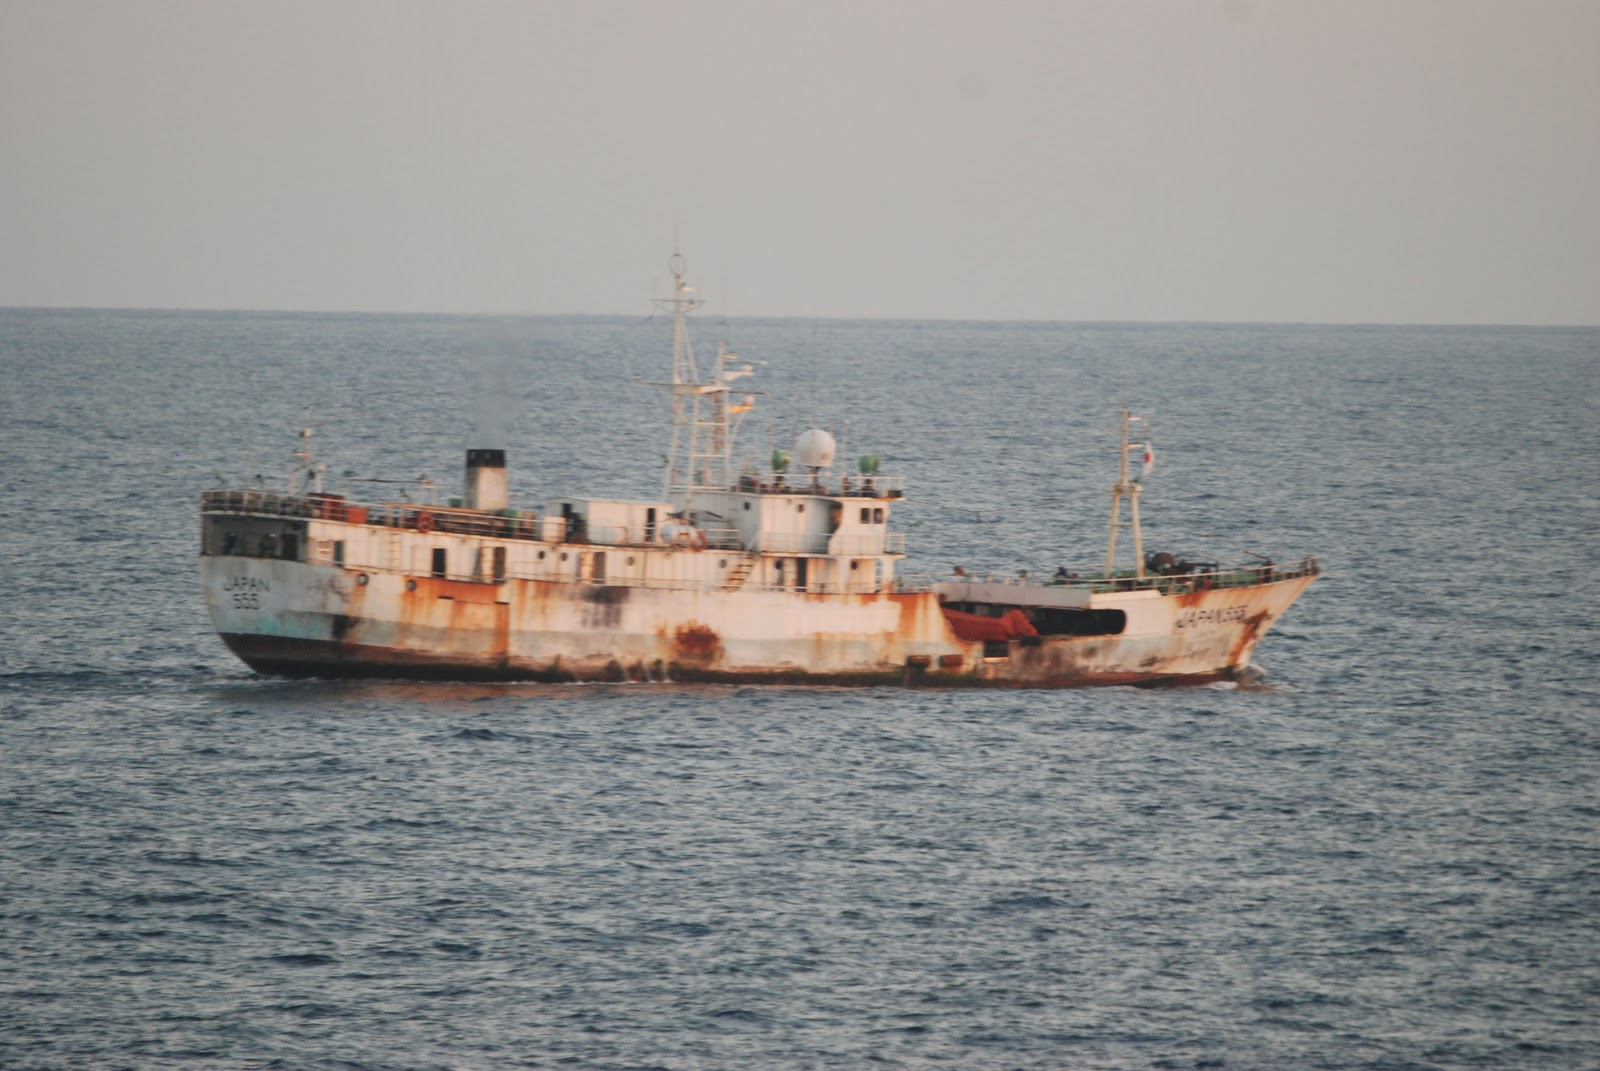 EagleSpeak Somali Pirates Jan NATO Shipping Centre Warnings - Pirates attack cruise ship